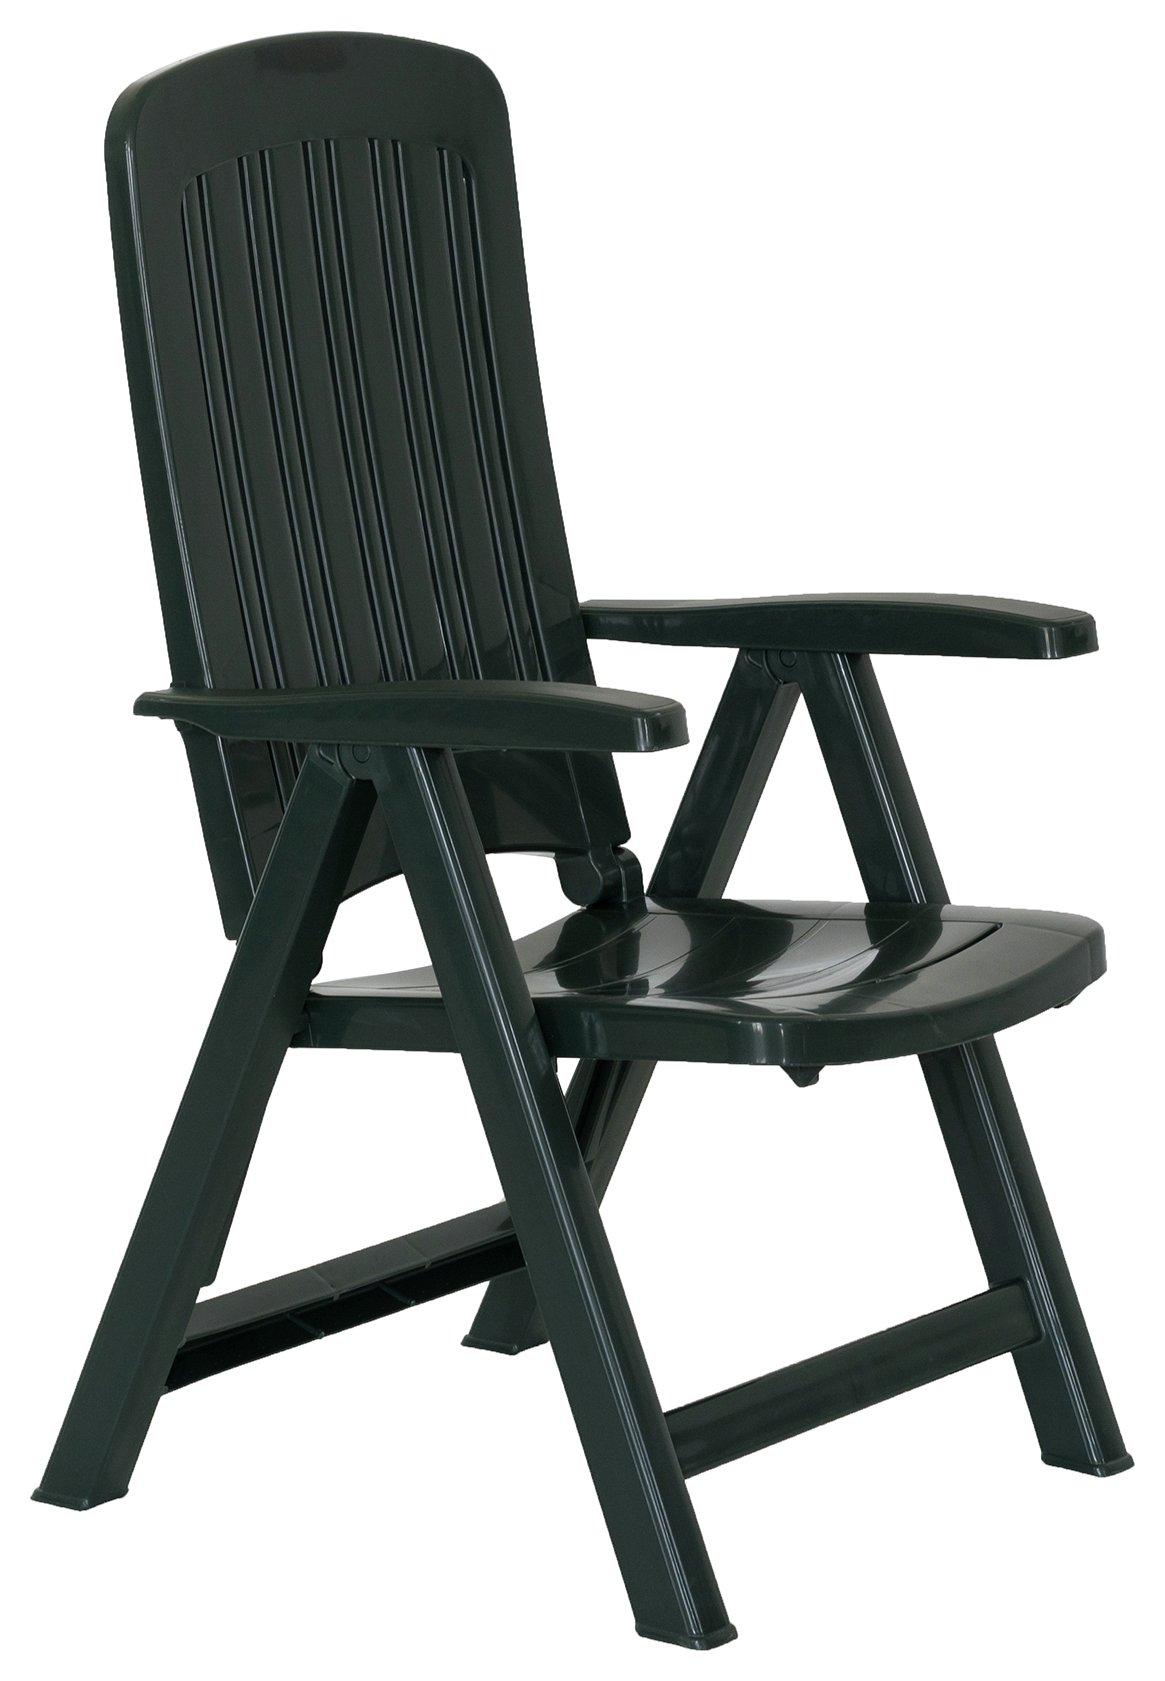 Reclining outdoor chair argos shop vifah eucalyptus for Chaise lounge argos